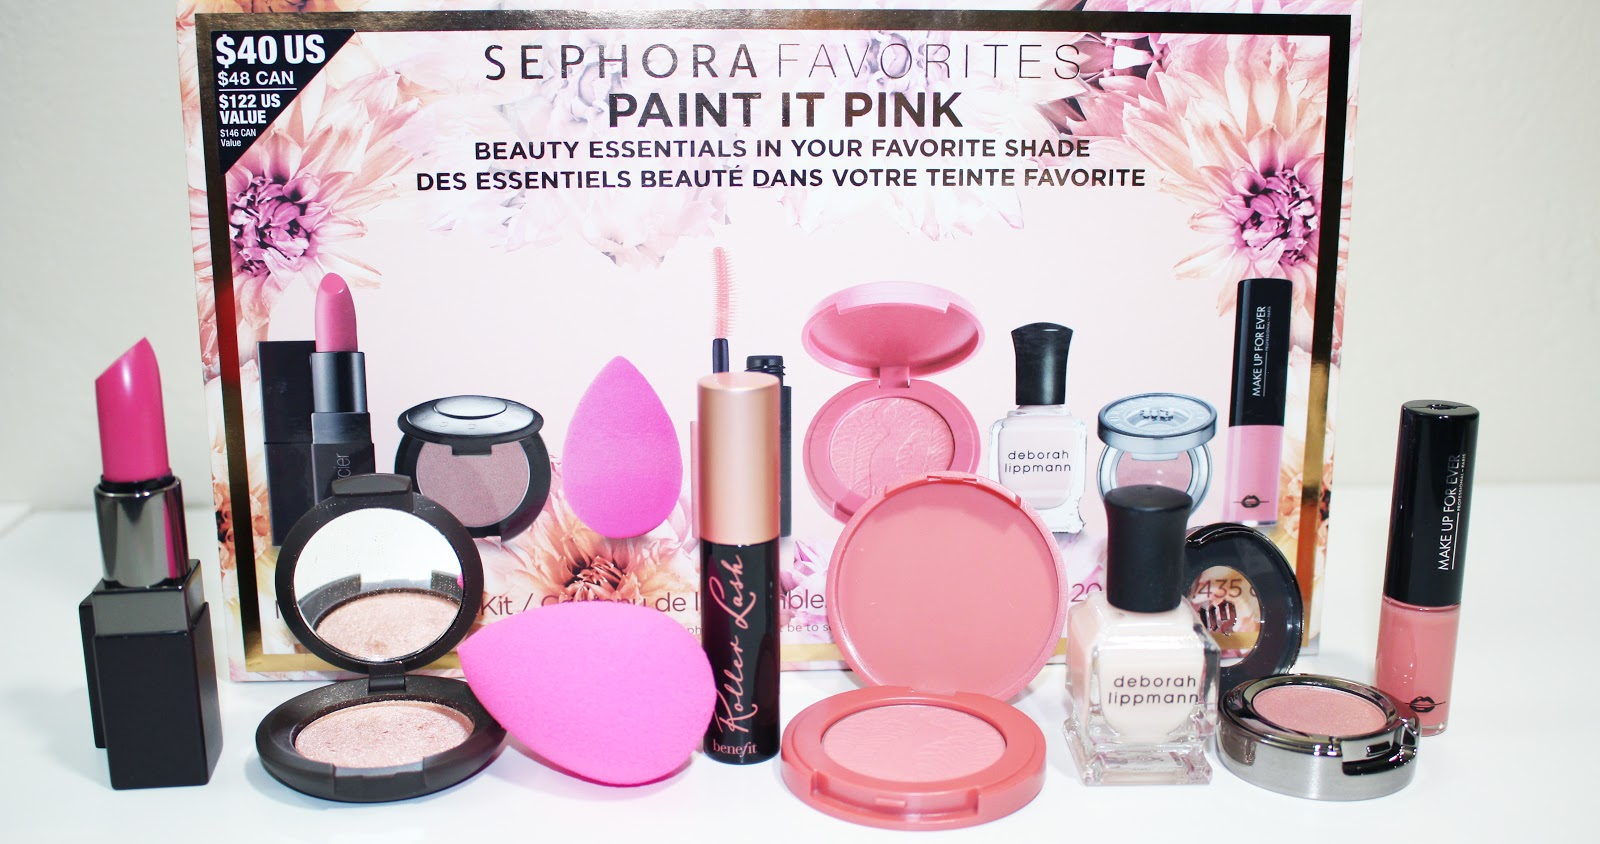 Sephora Favorites Paint In Pink Value Kit